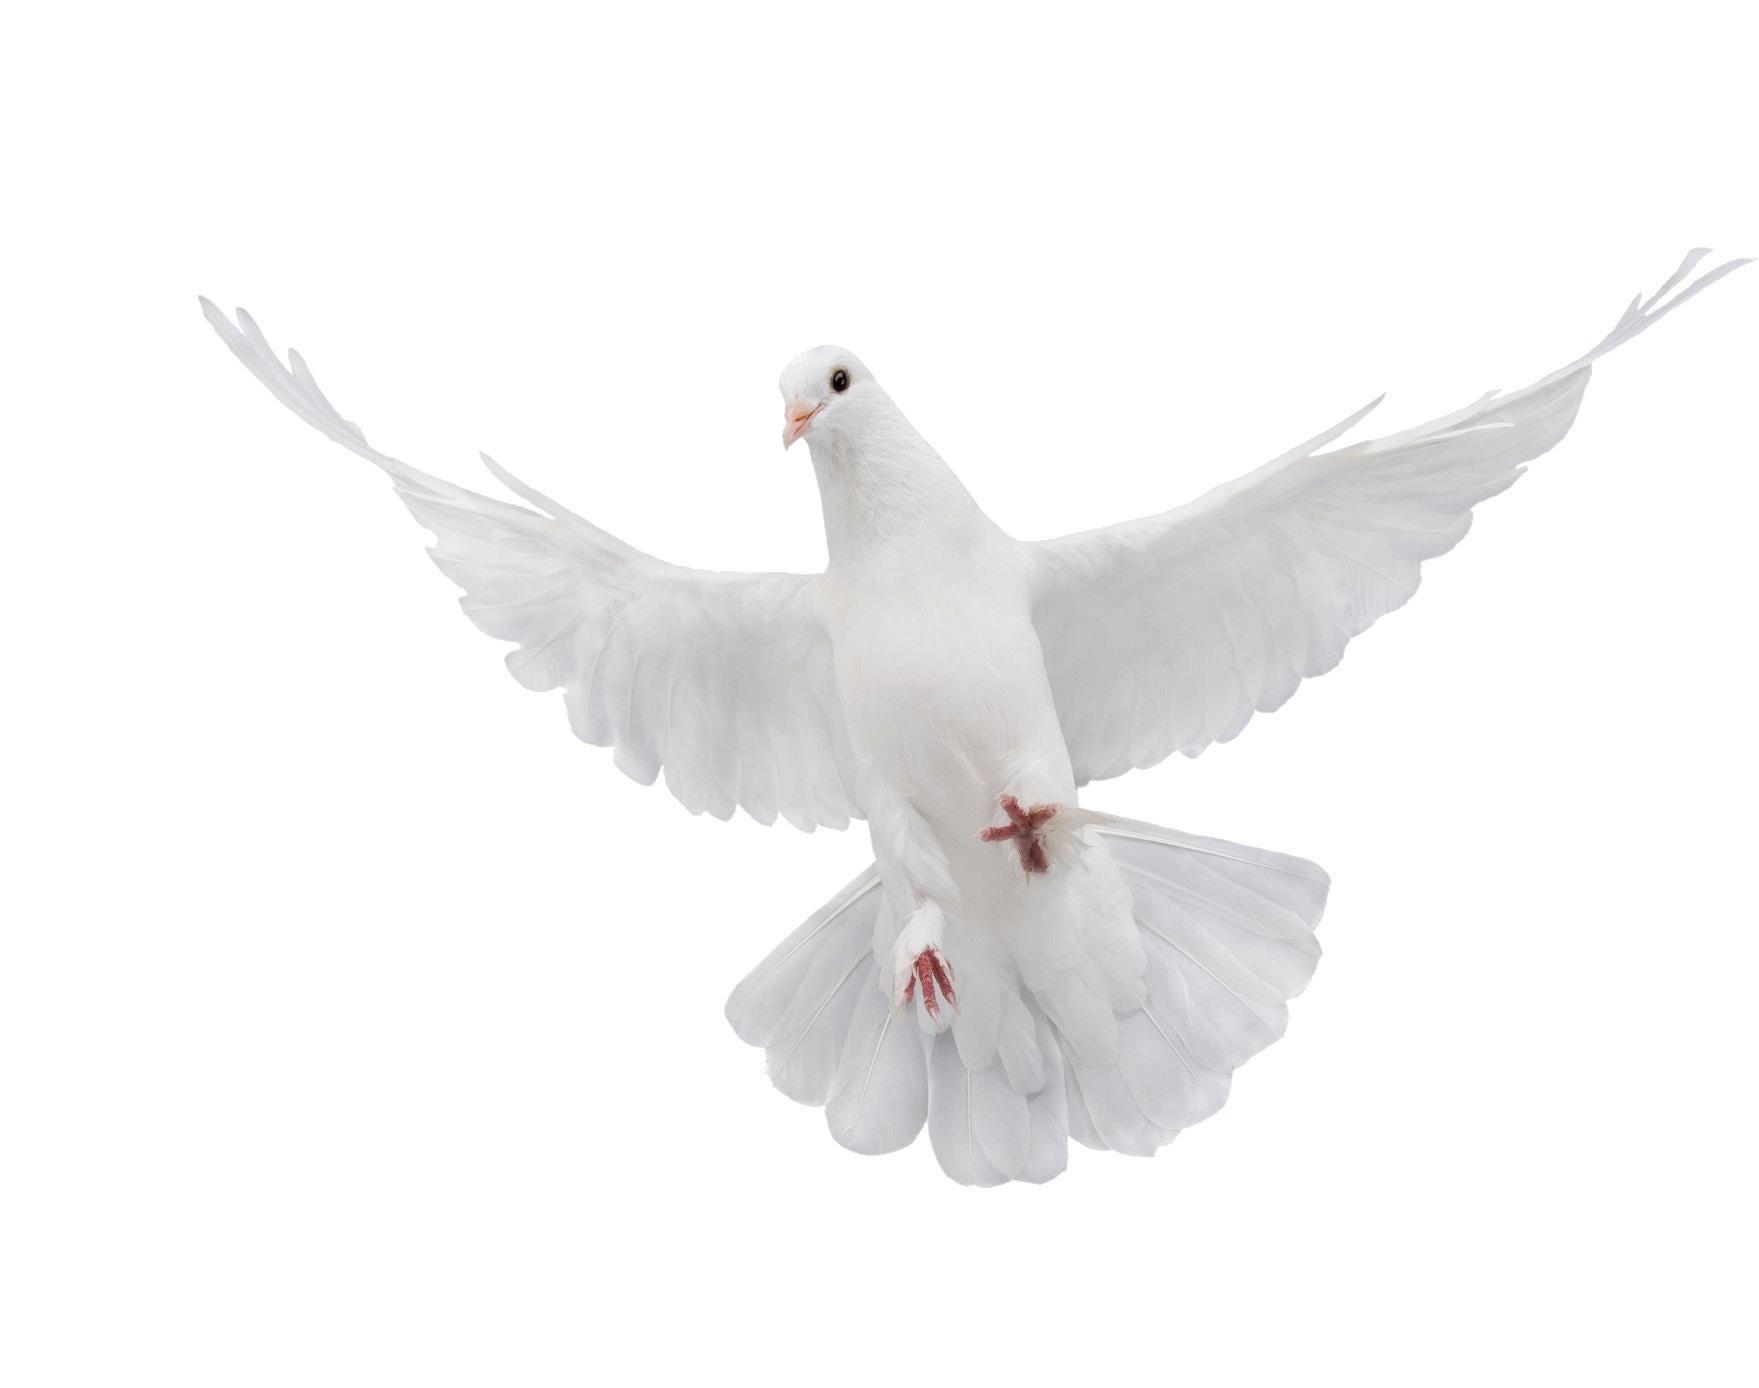 Page 5 of Holy Spirit Alive Conference November 12-13